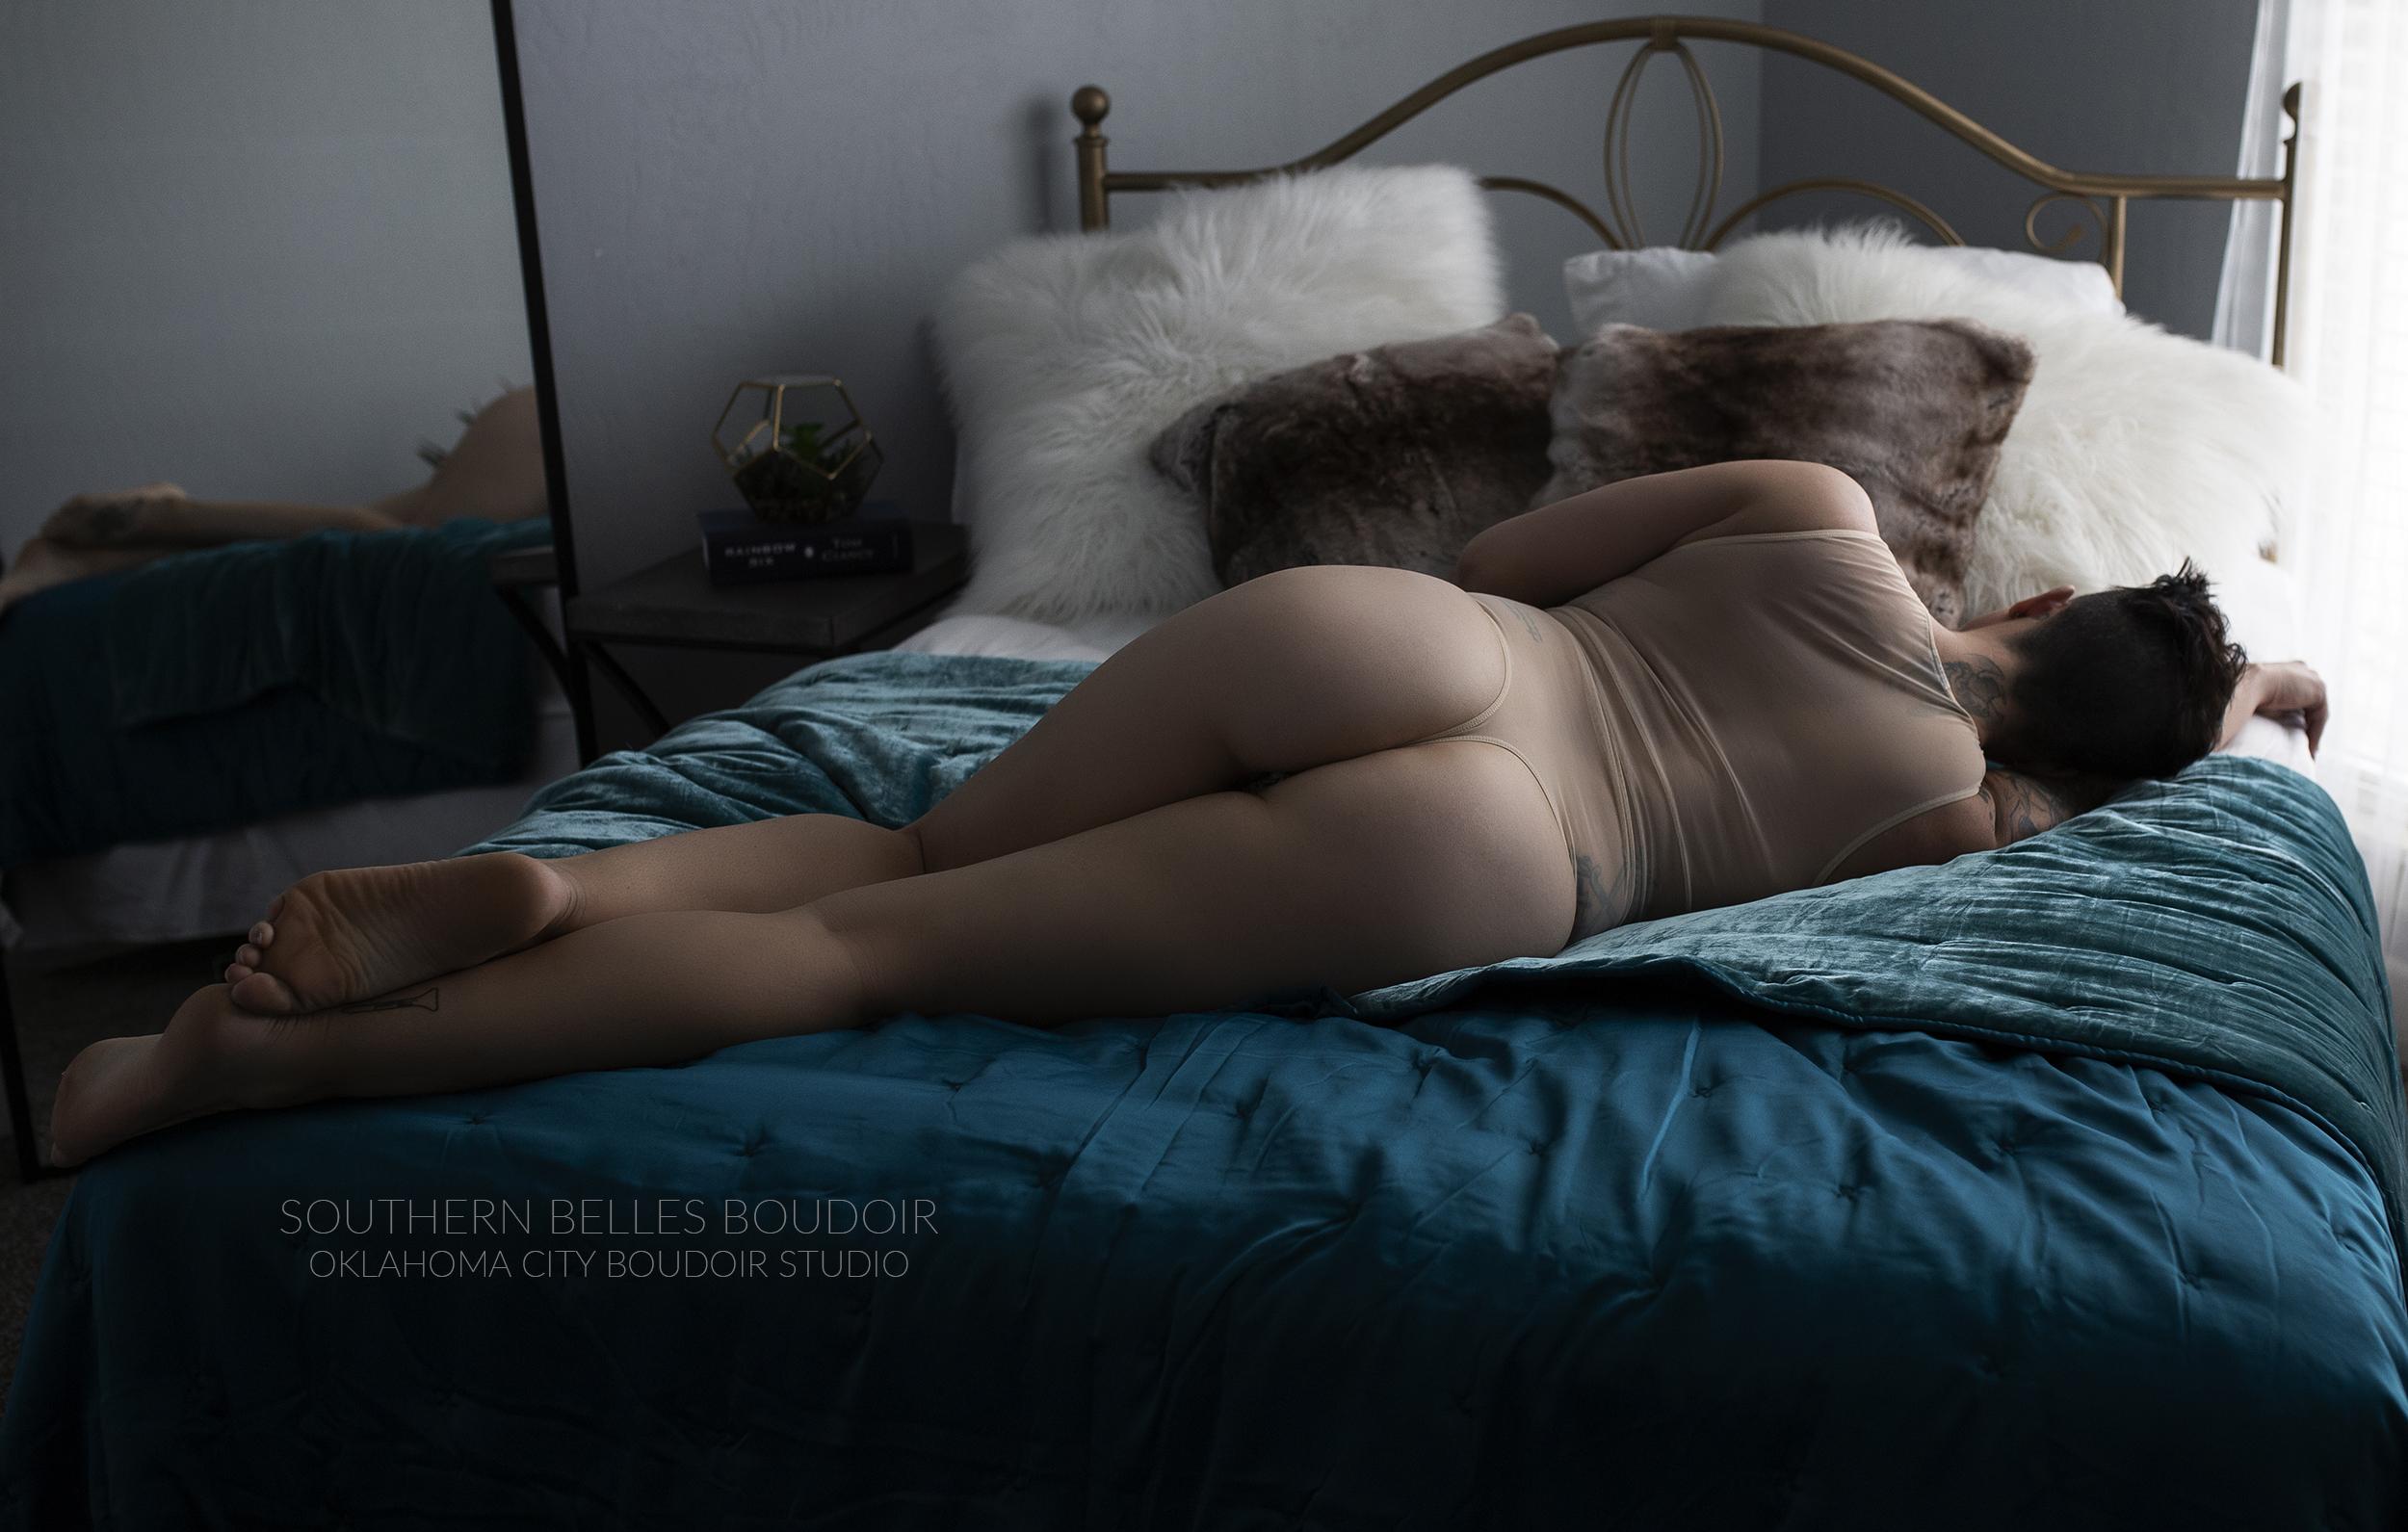 boudoirphotoshootokc.jpg